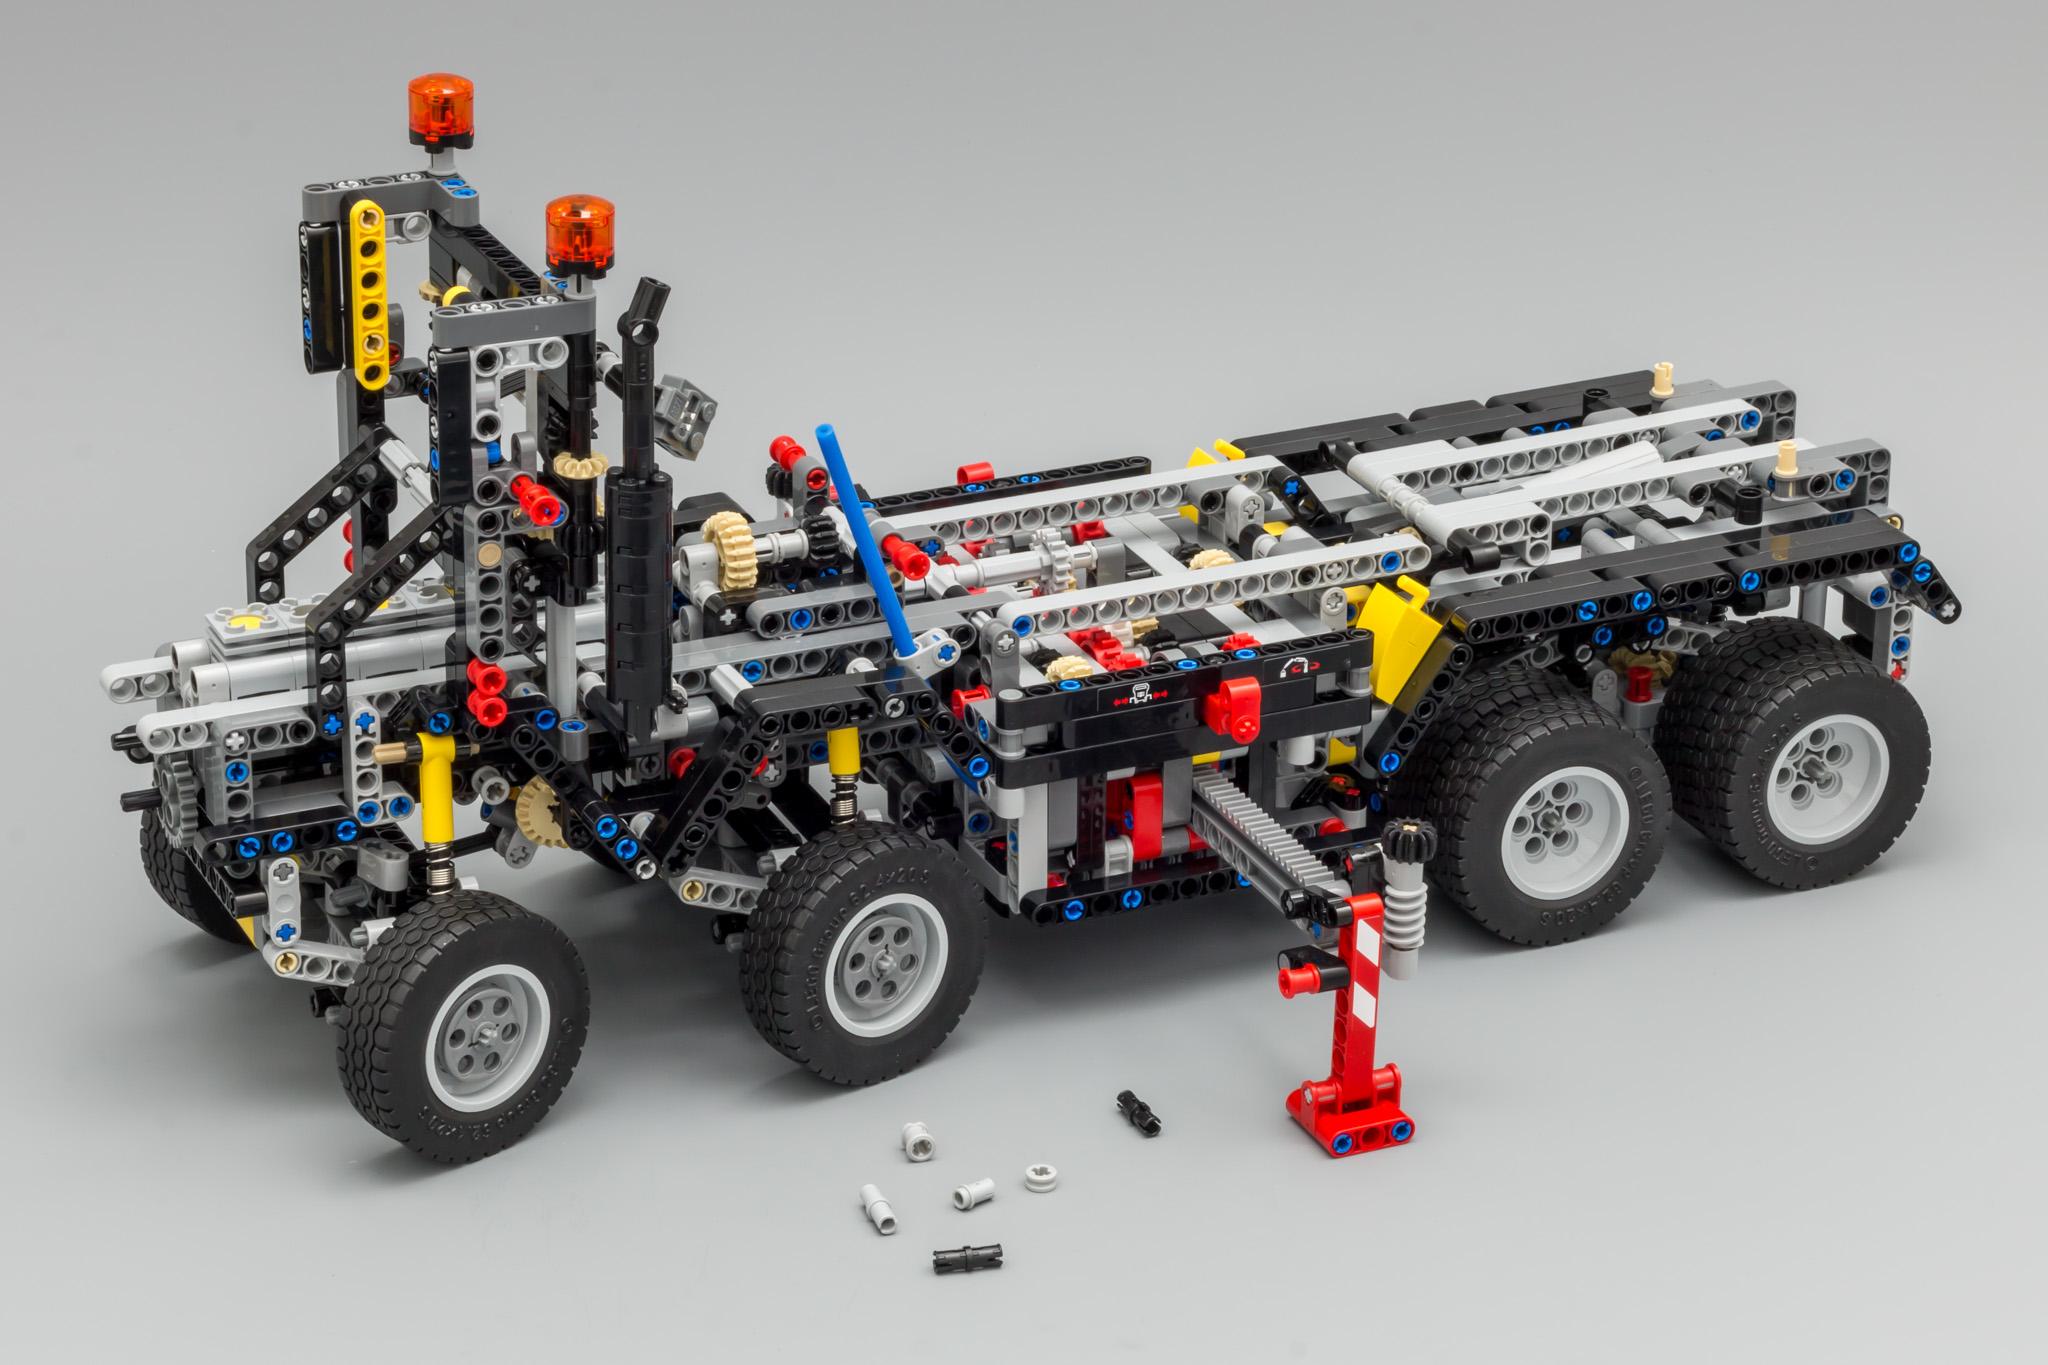 lego technic 42043 b model instructions